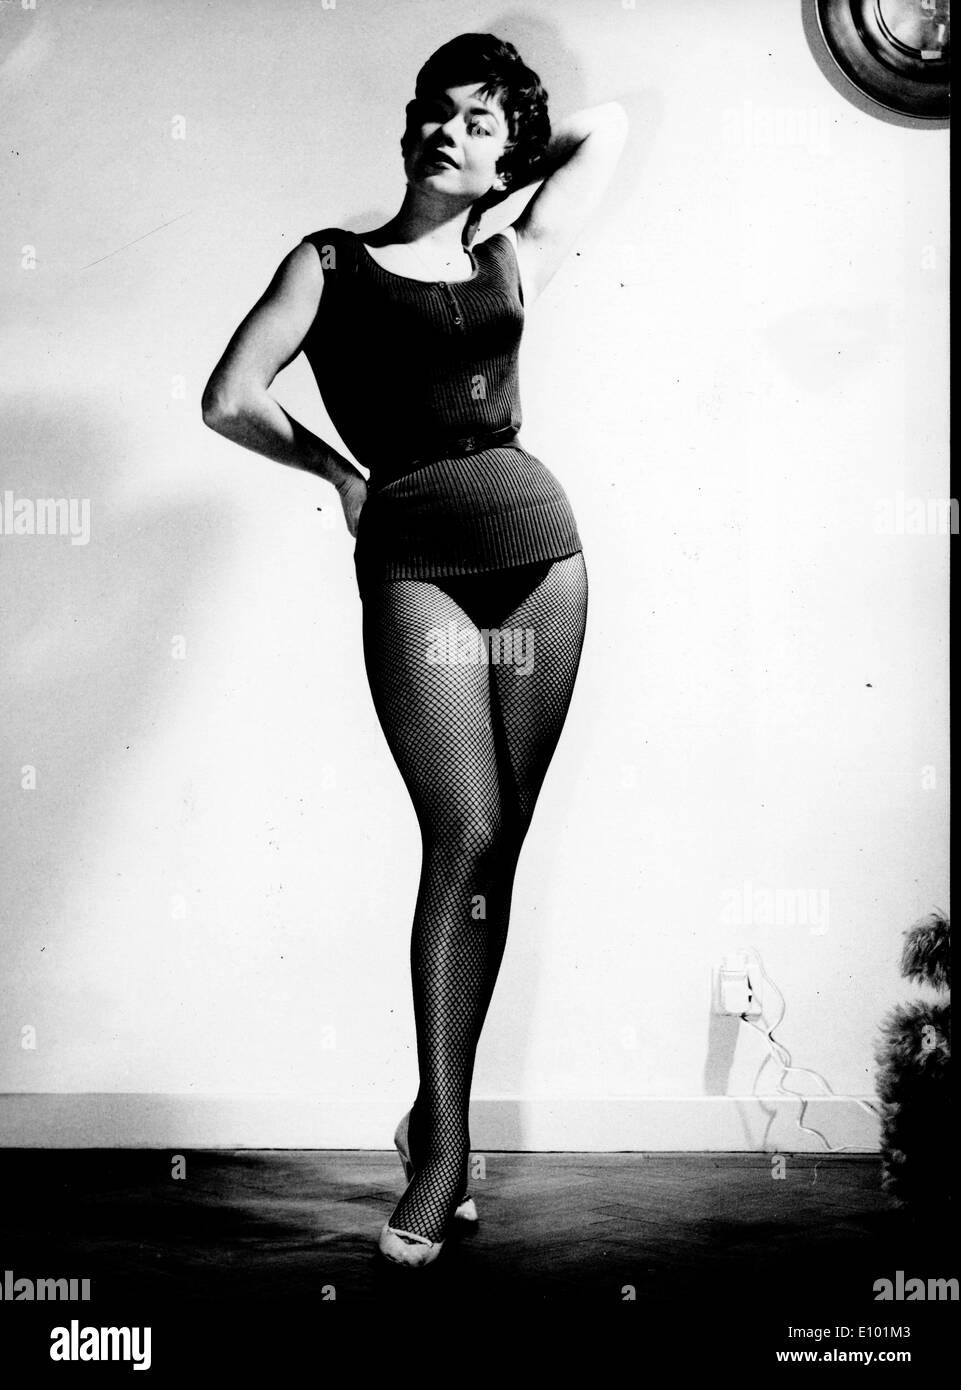 English Dancer actress GILLIAN VAUGHAN poses in a studio - Stock Image